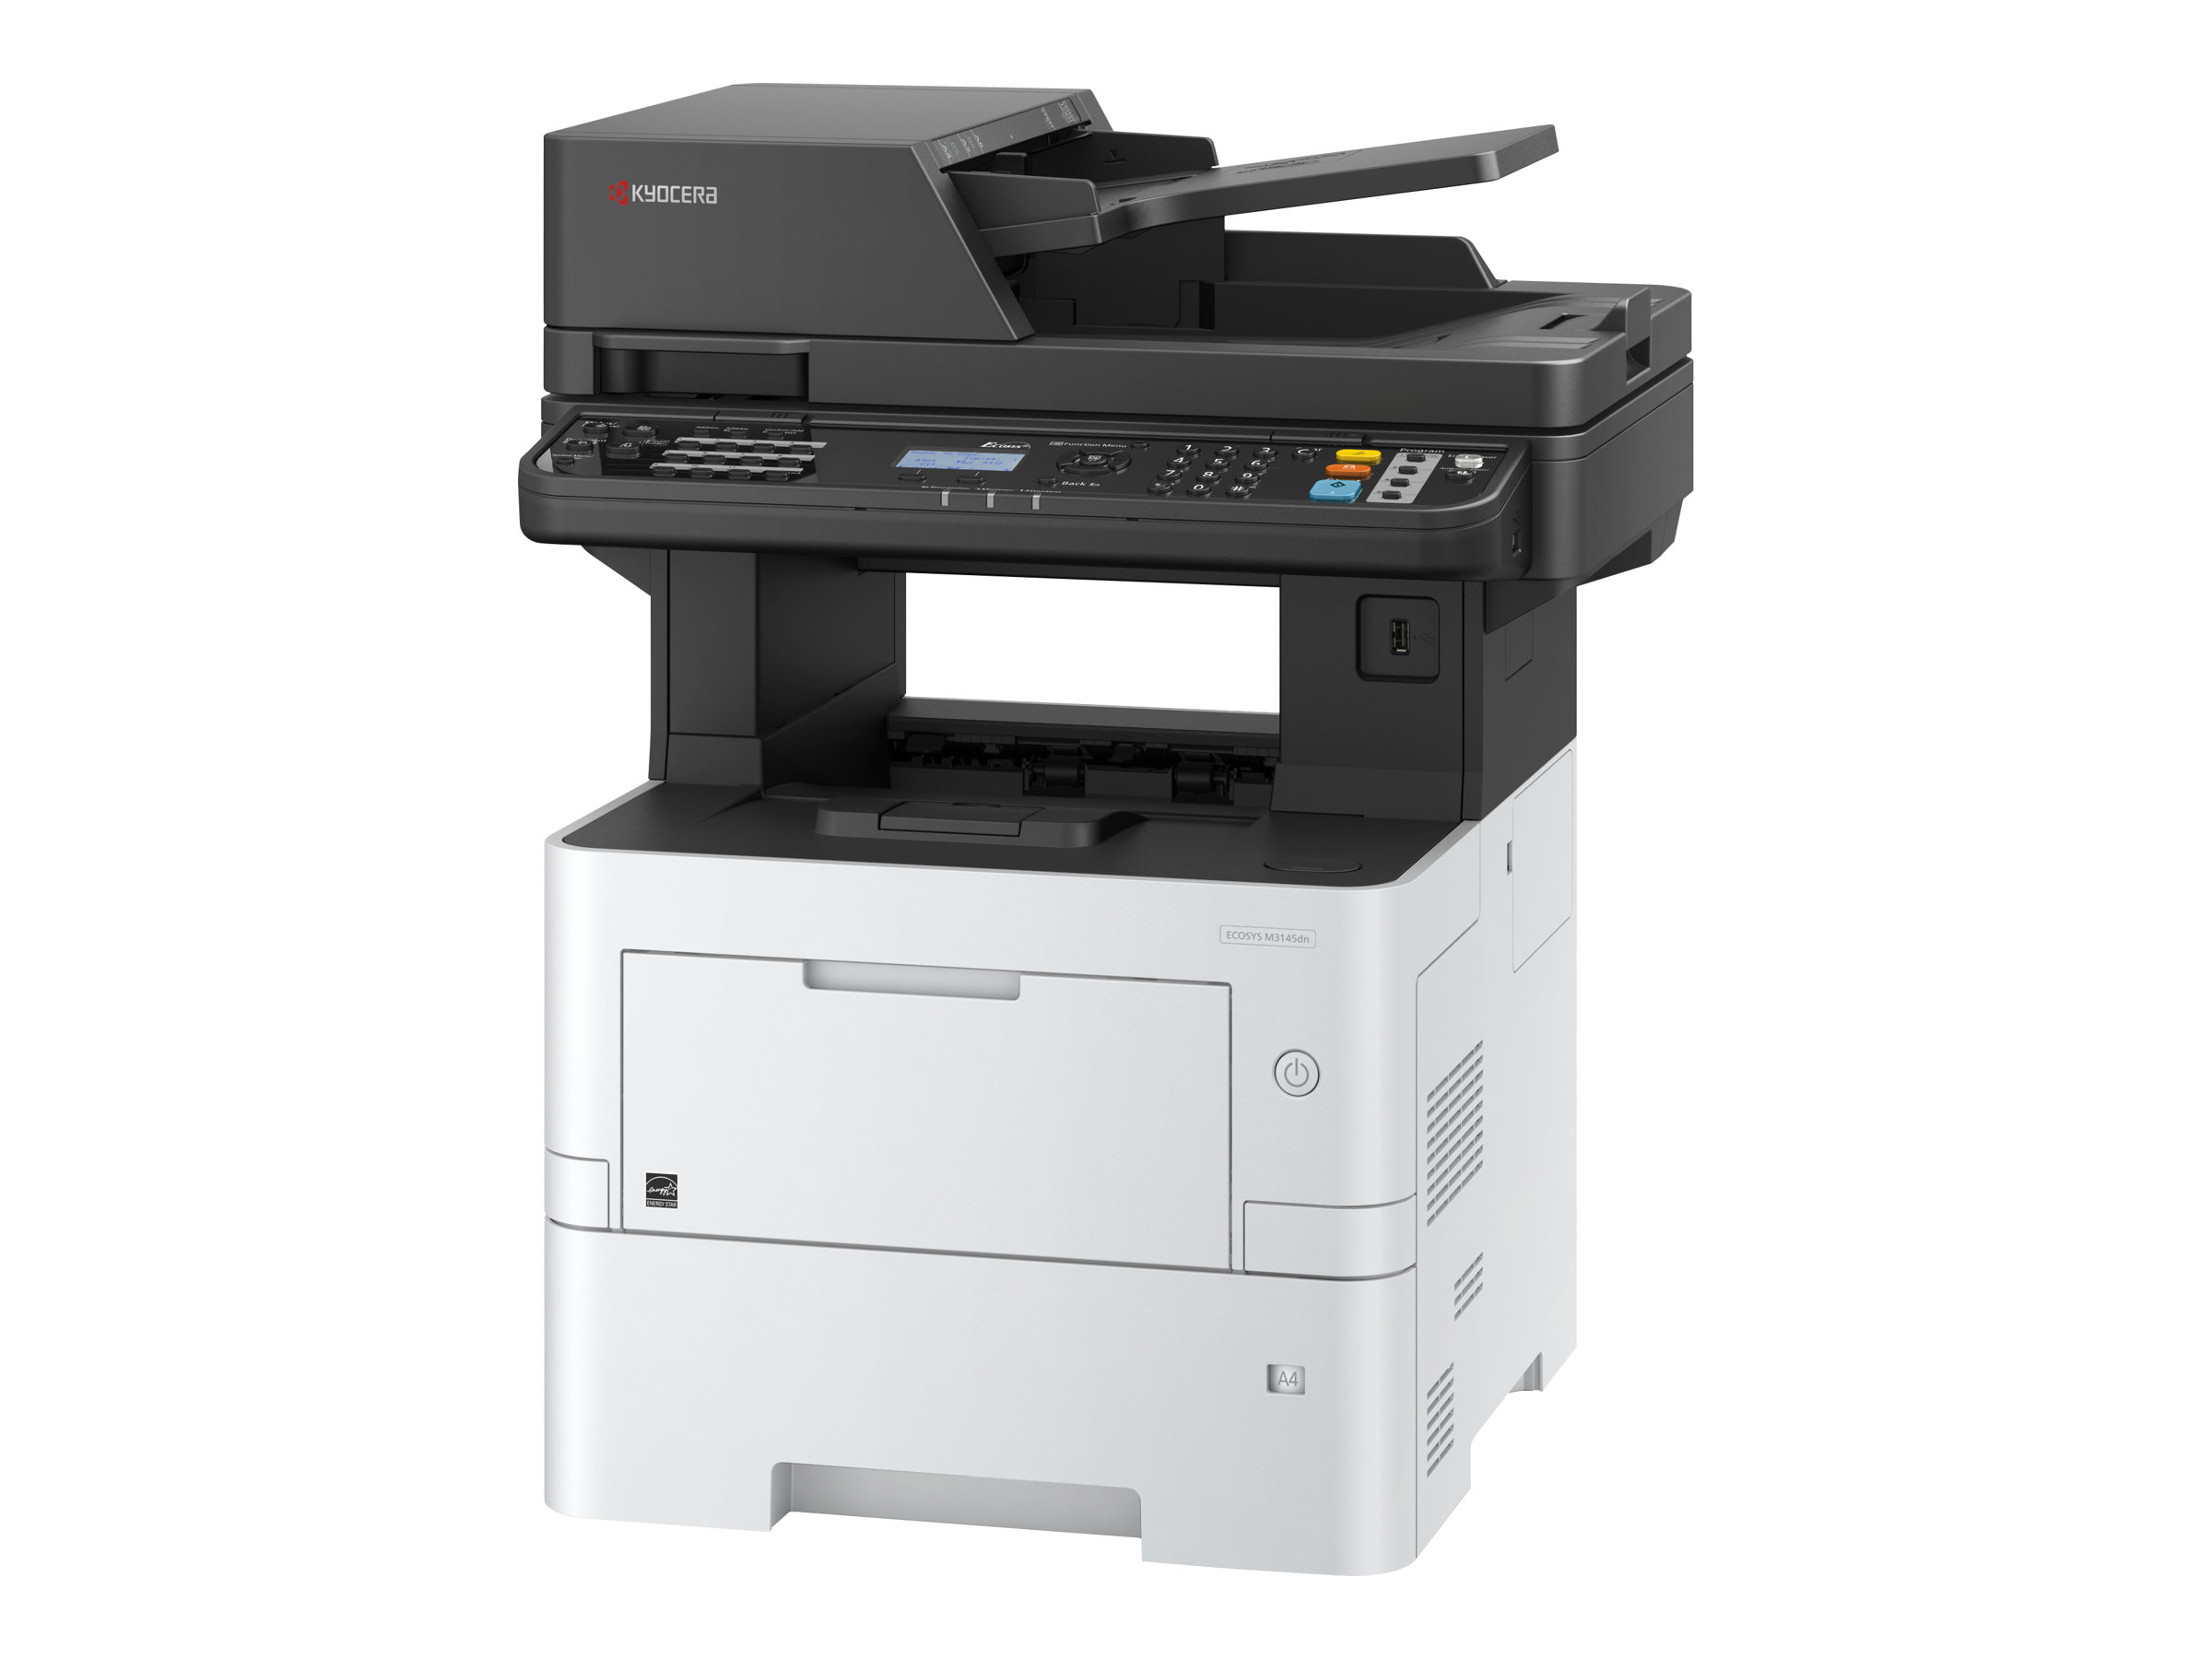 Kyocera ECOSYS M3145DN - Multifunktionsdrucker - s/w - Laser - A4 (210 x 297 mm), Legal (216 x 356 mm) (Original) - A4/Legal (Me